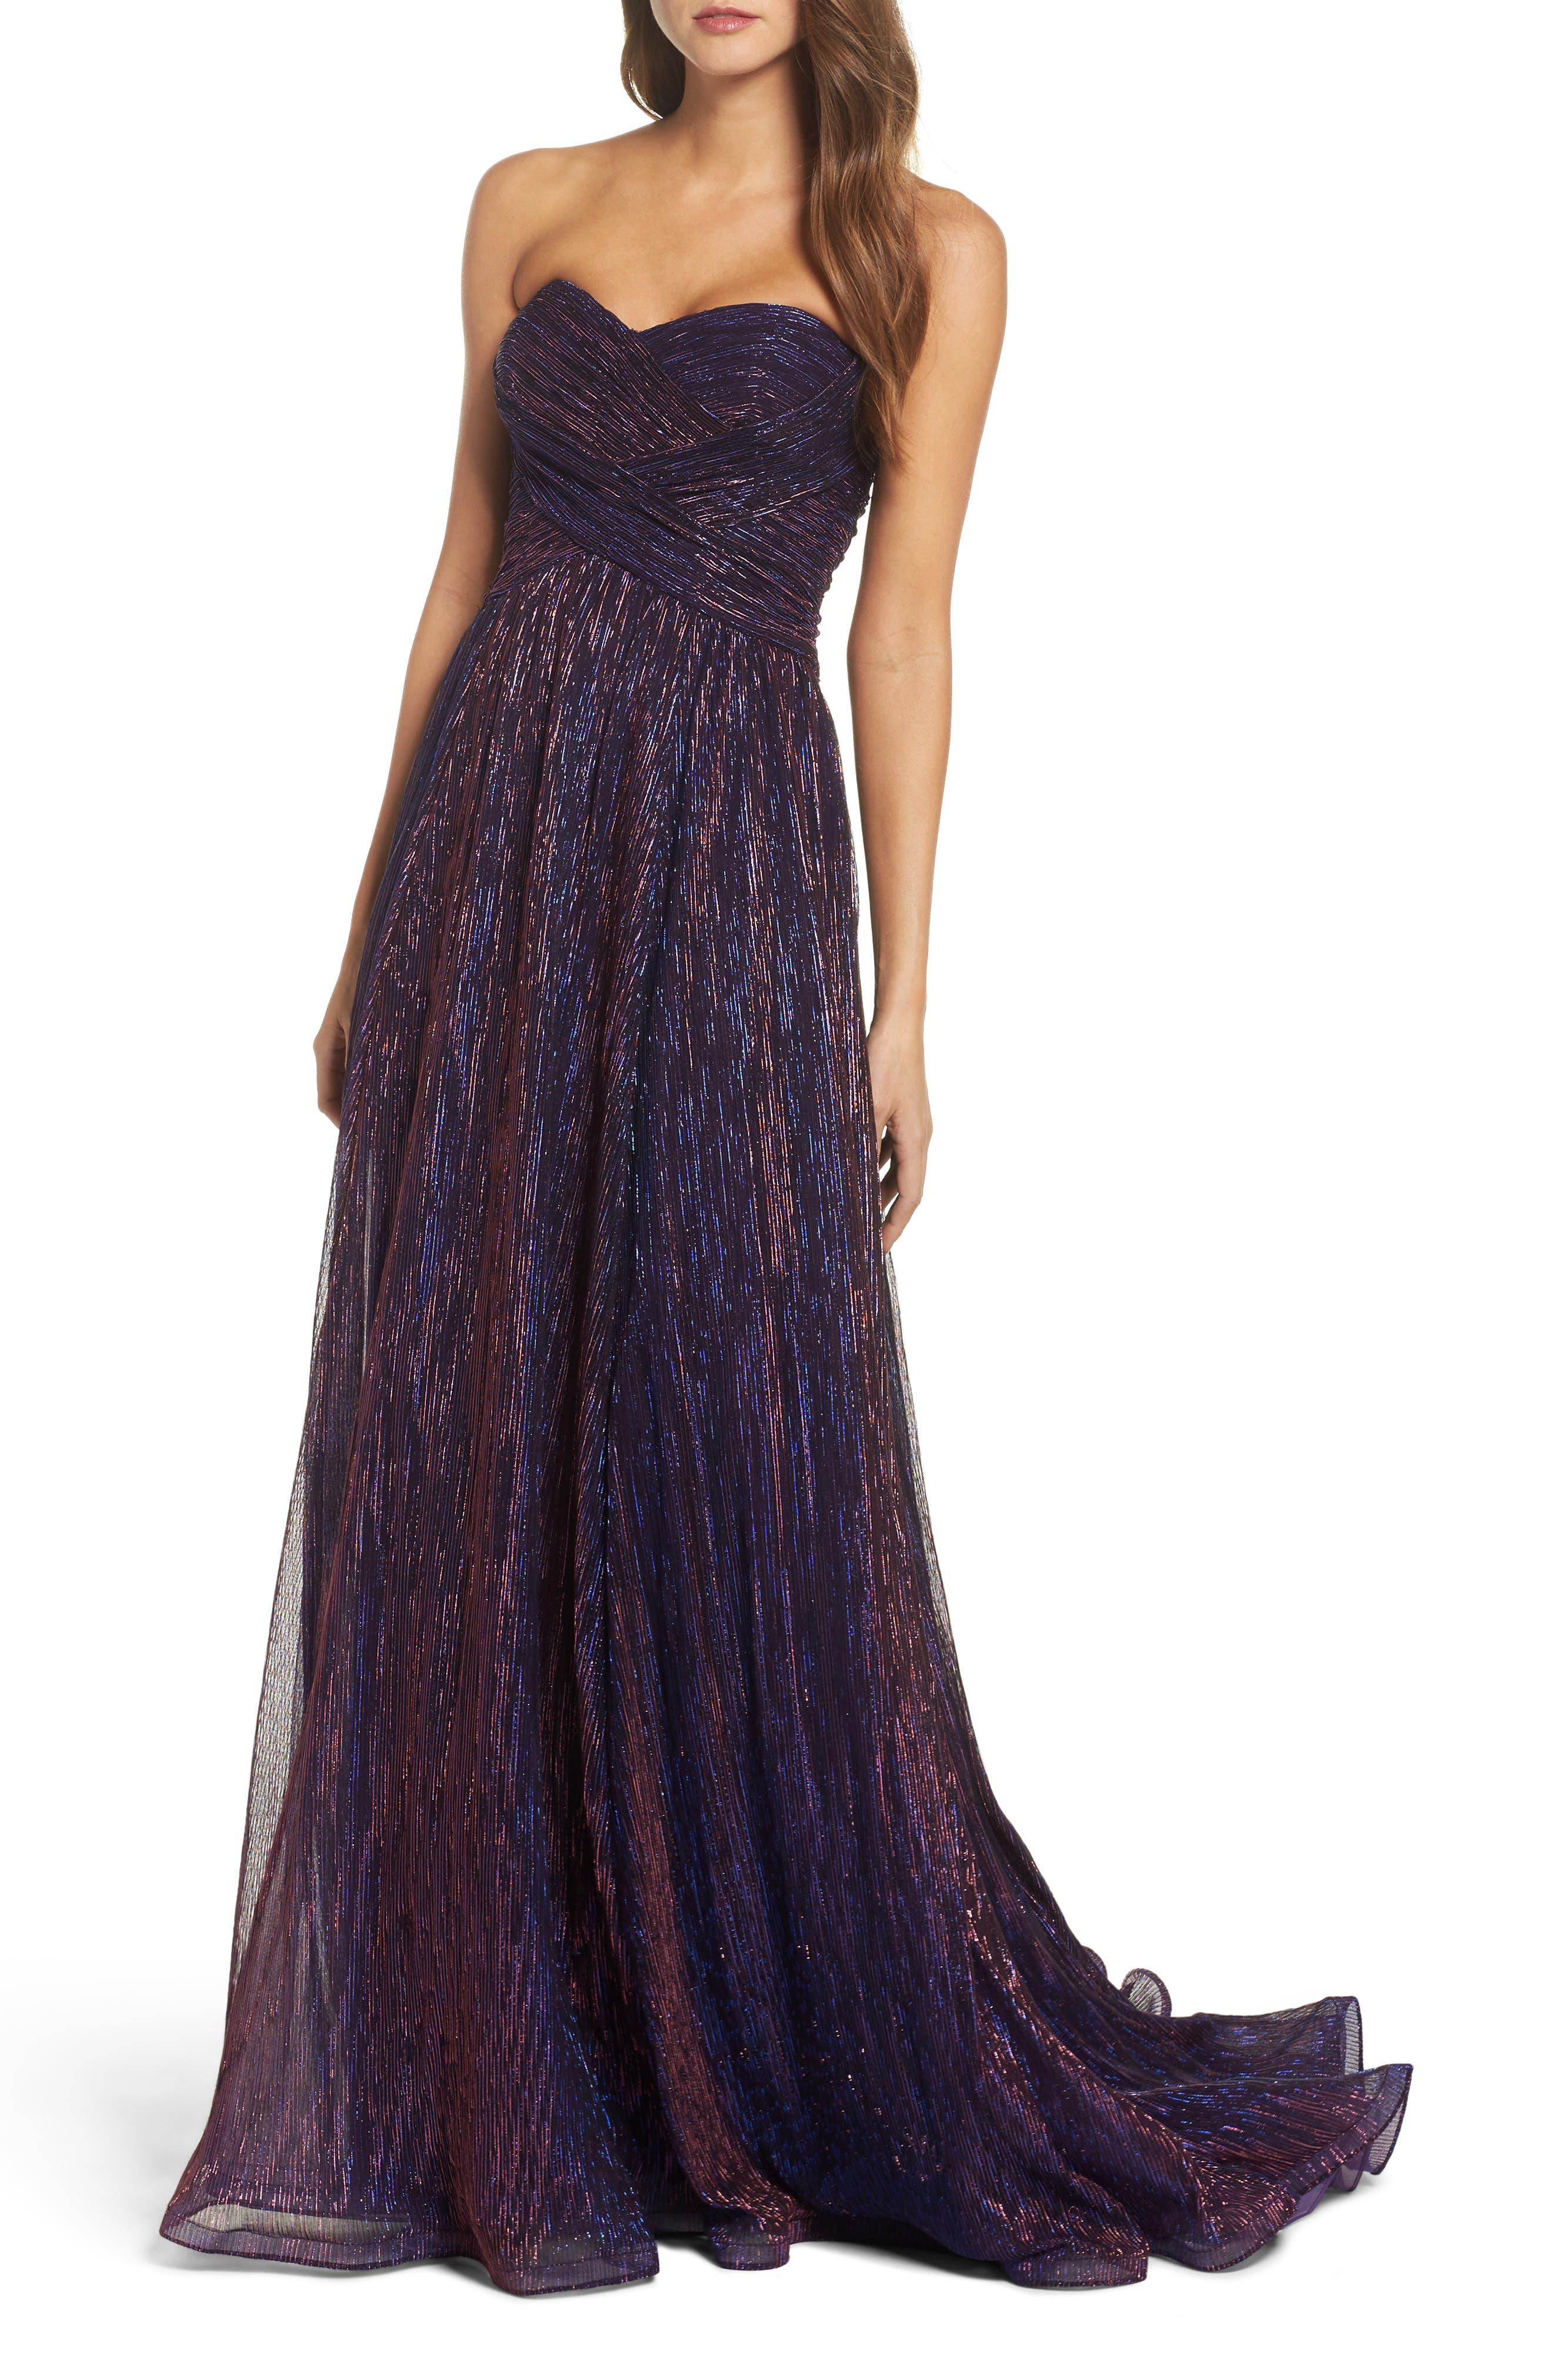 Main Image - La Femme Metallic Strapless A-Line Gown